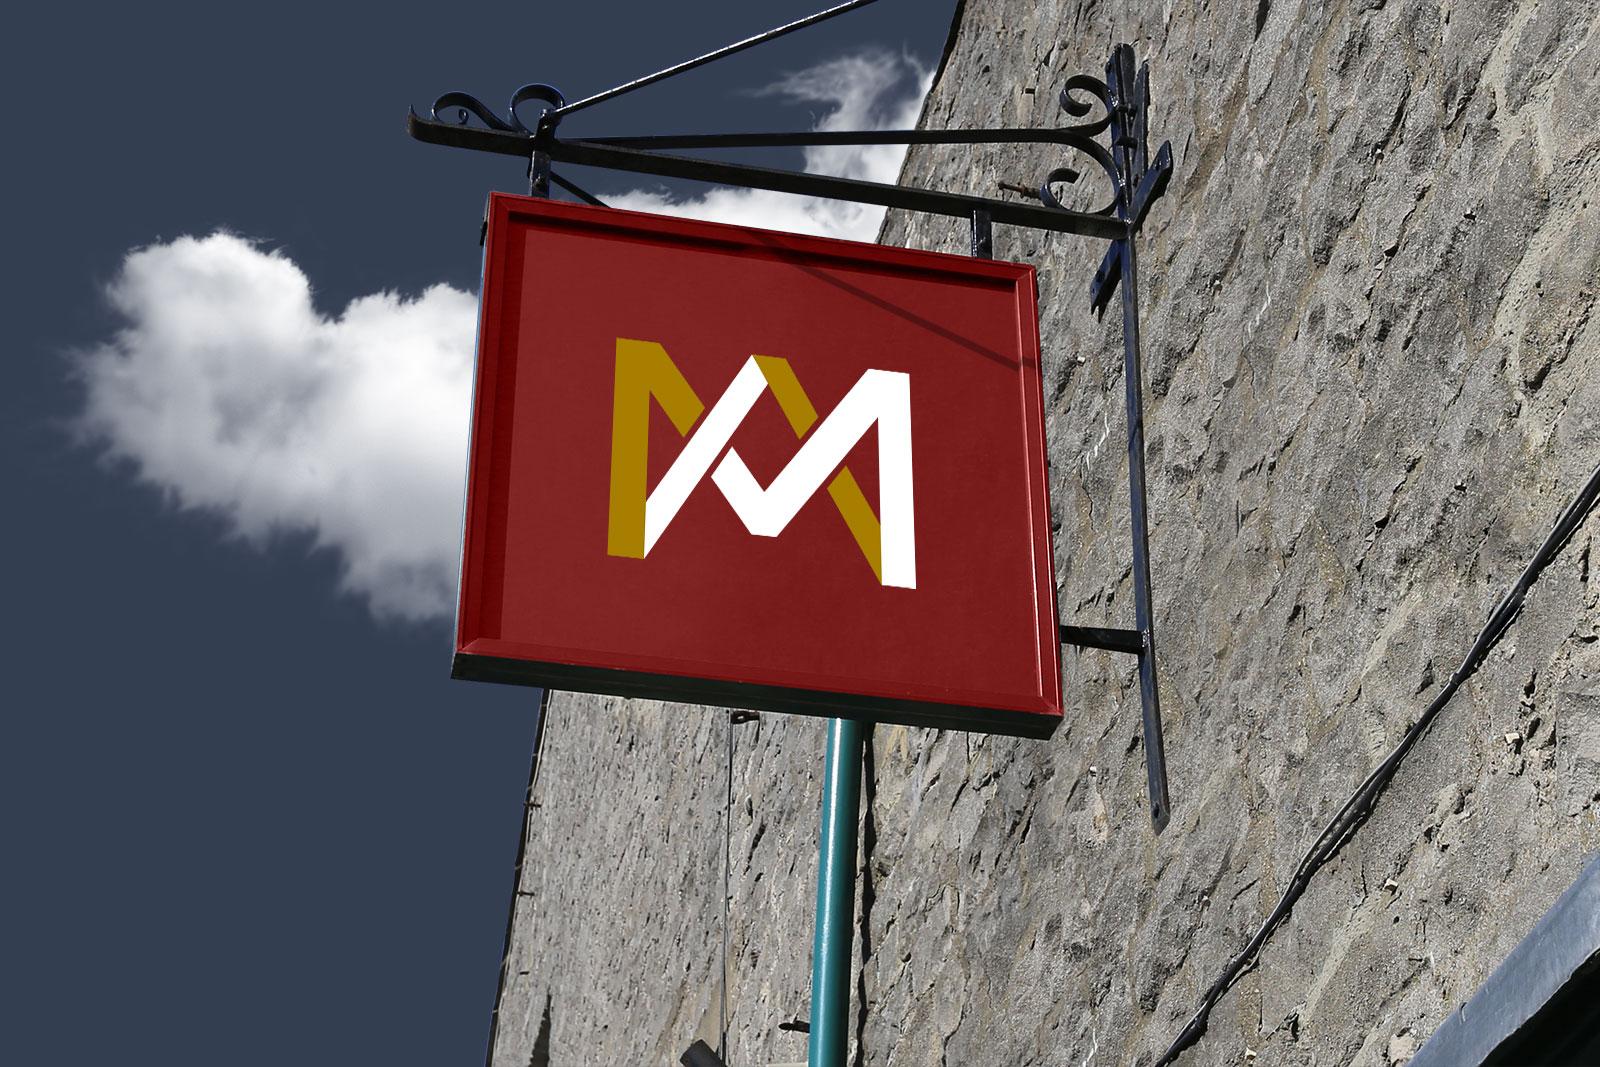 Free-Wall-Mounted-Shop-Sign-Board-Mockup-PSD-file